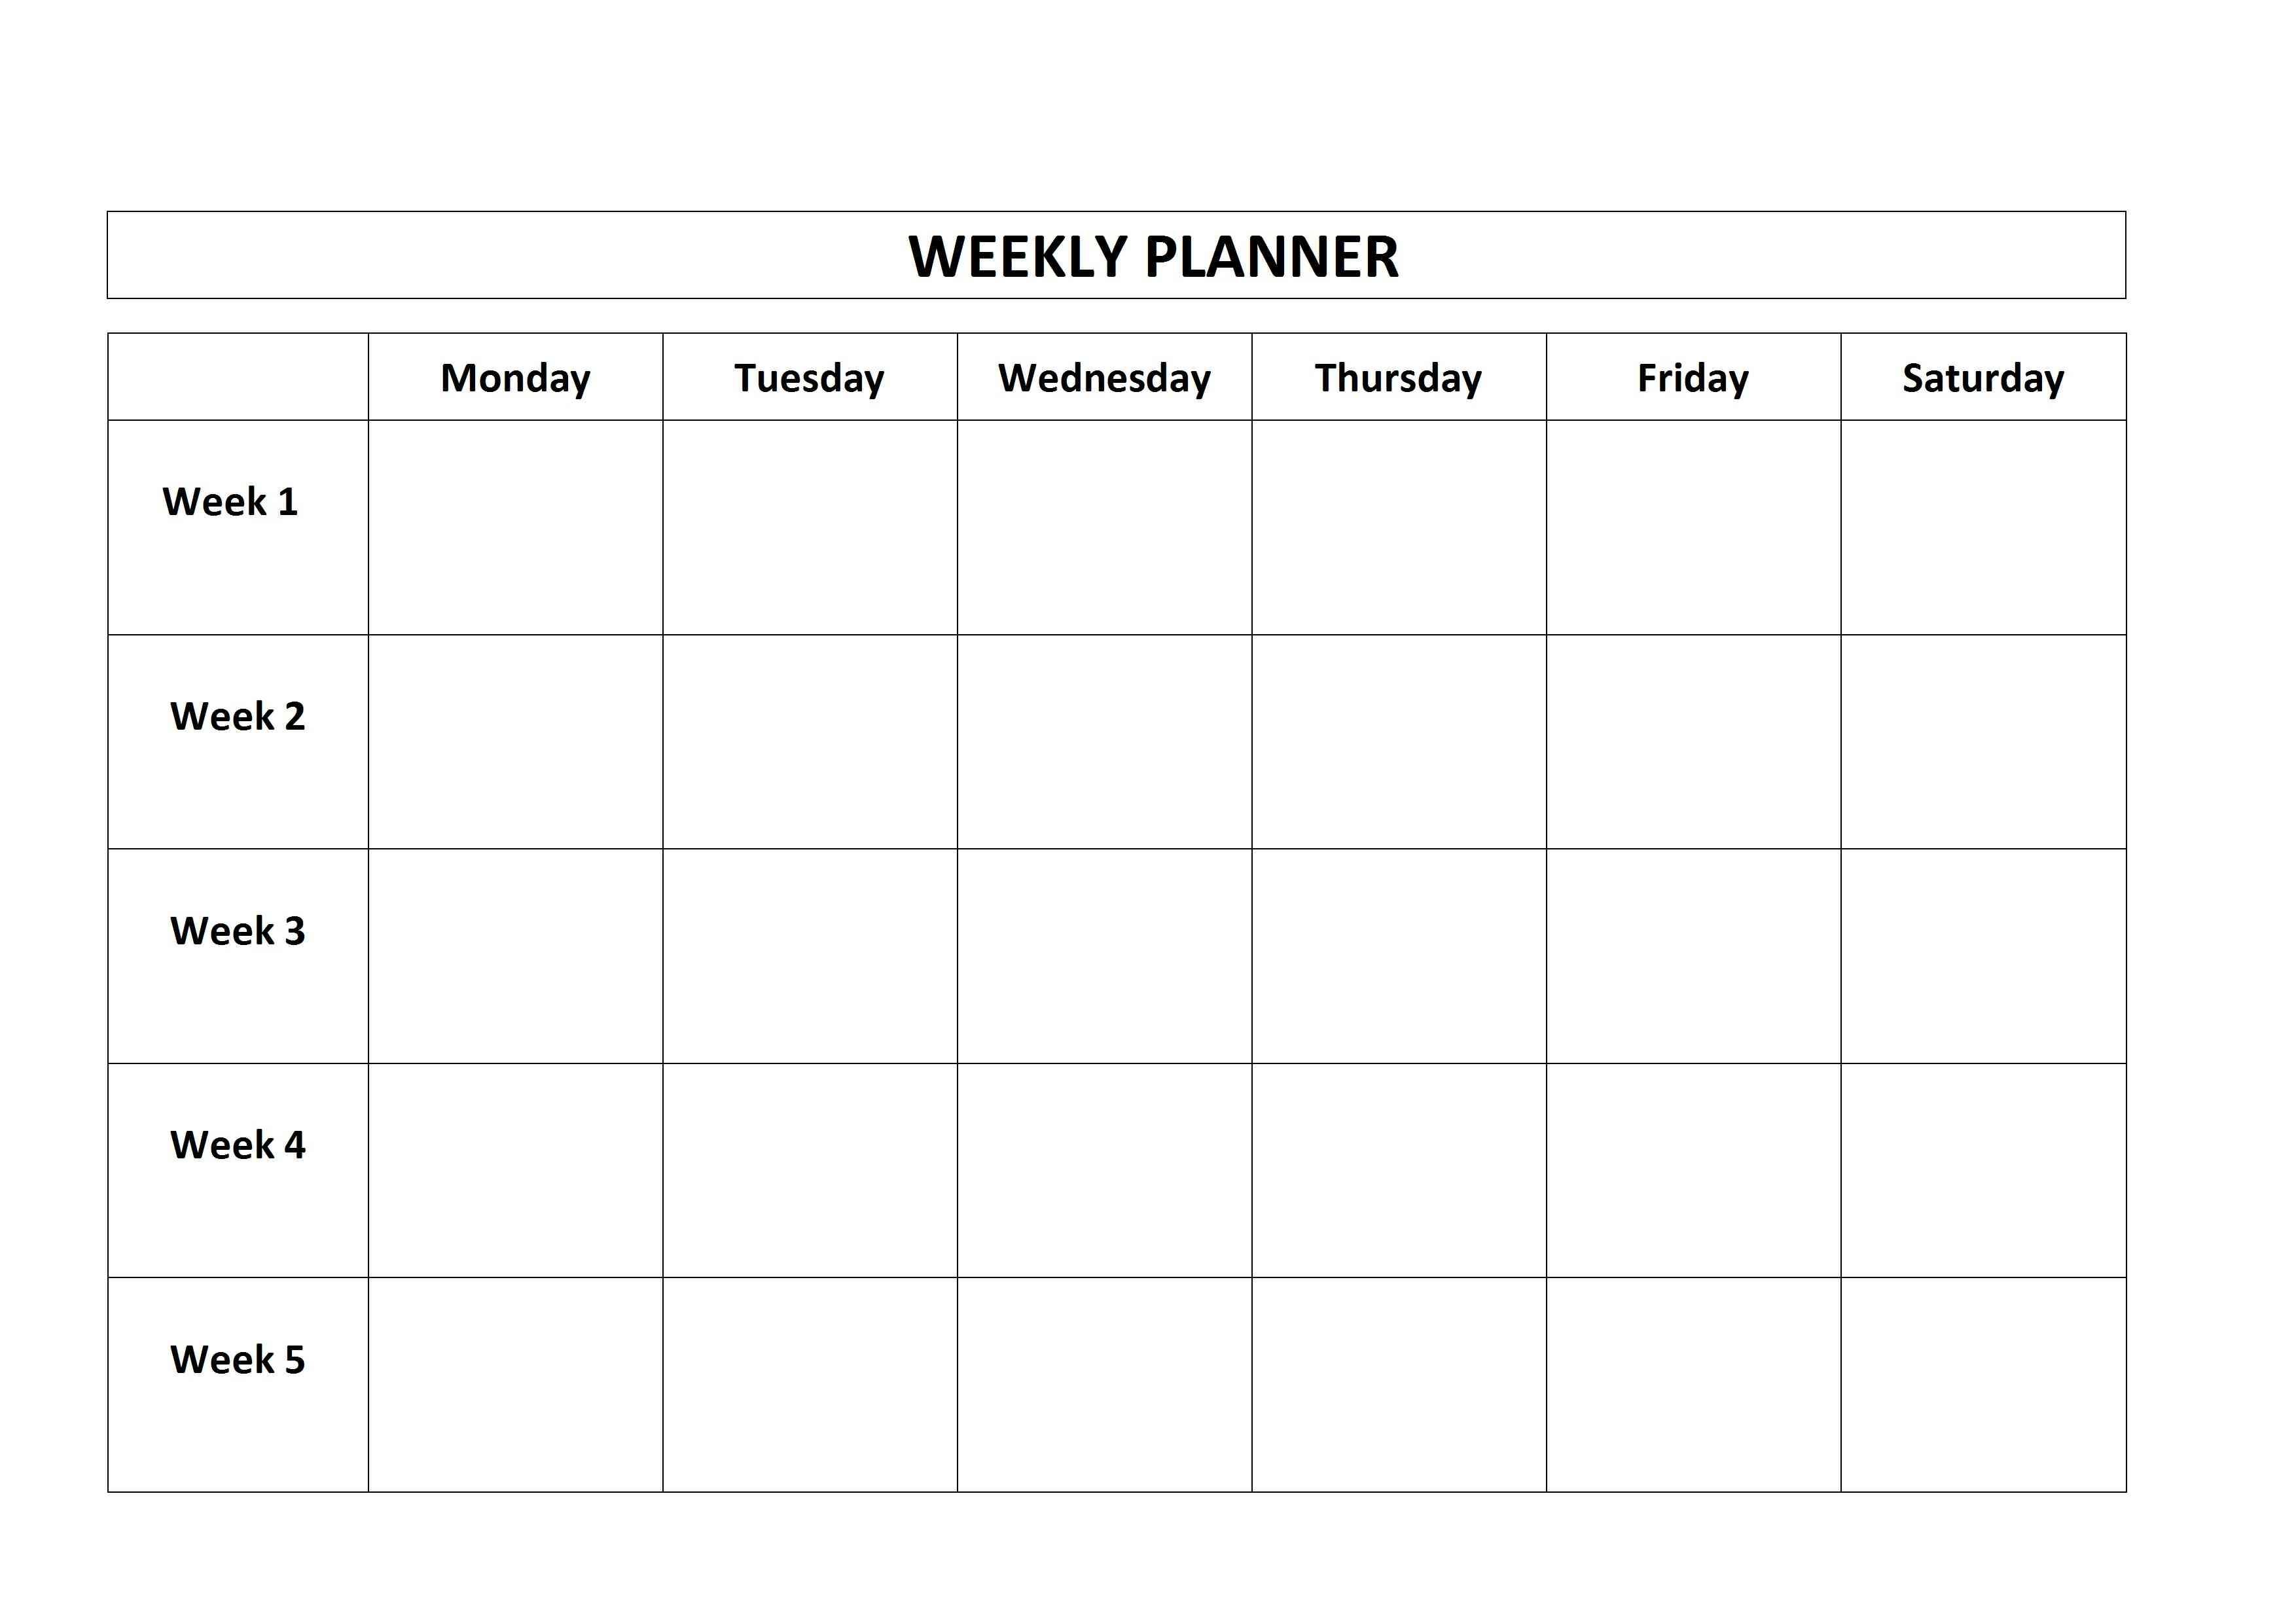 Monday Ugh Friday Weekly Calendar Template Thru Schedule